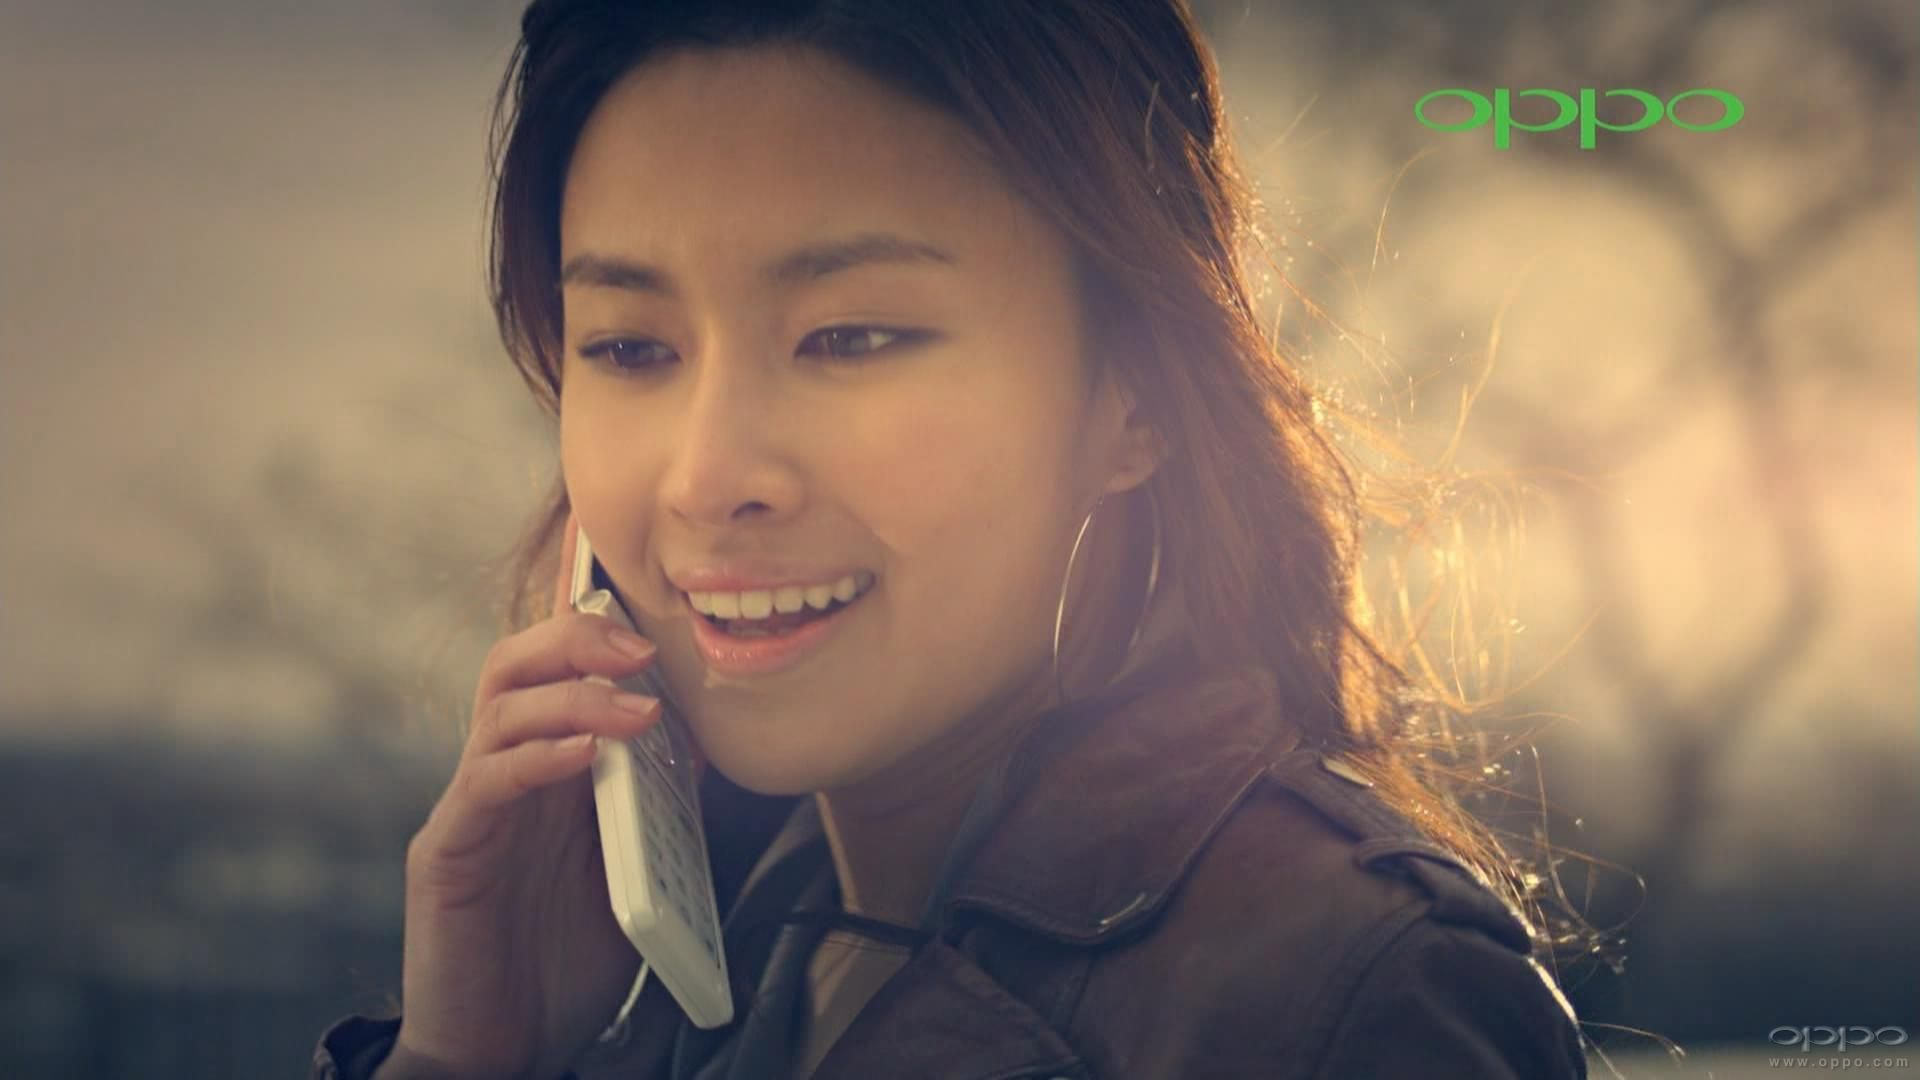 oppo手机广告男主角_oppo最新款翻盖手机广告的女主角是谁?_百度知道